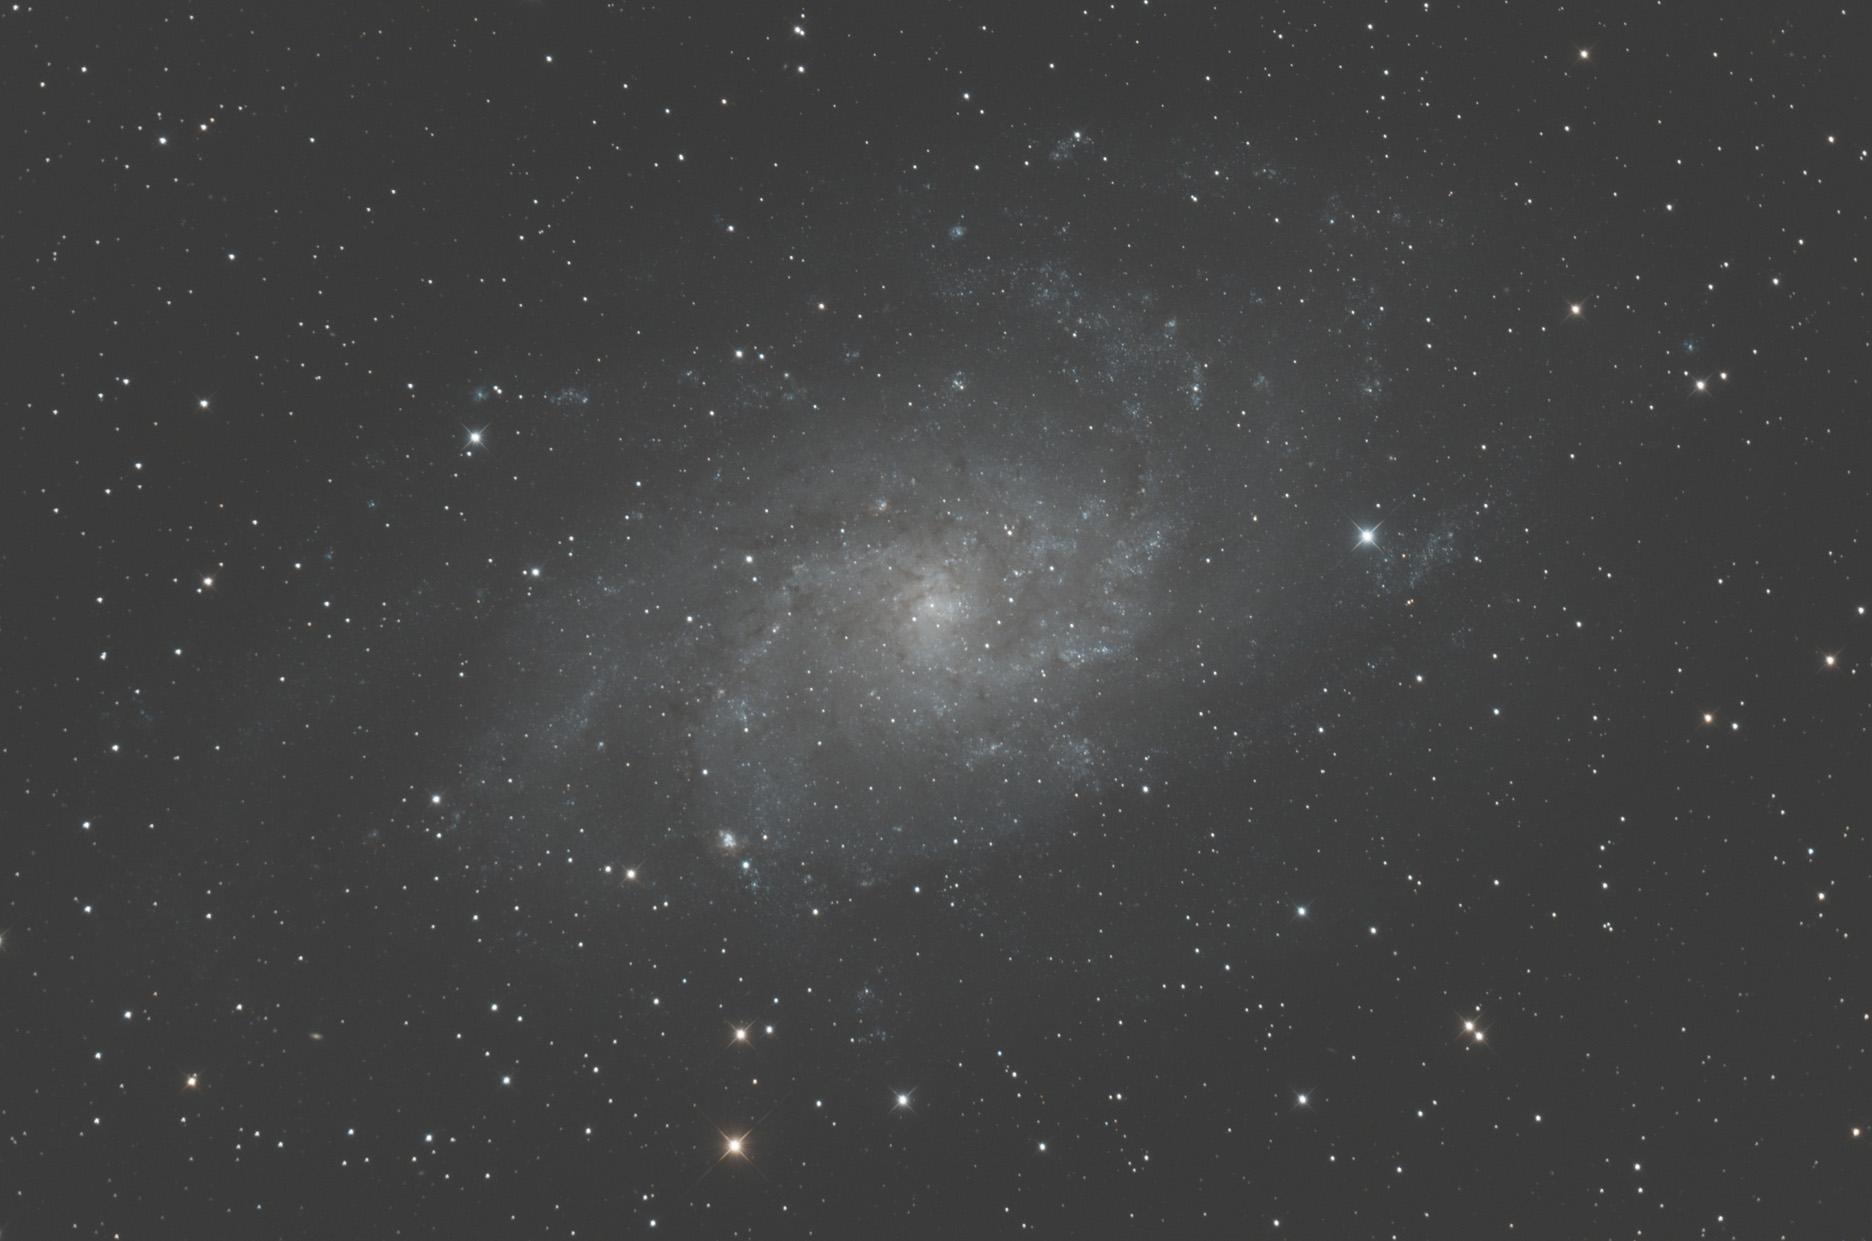 M33-post-processing-no-Photoshop.jpg